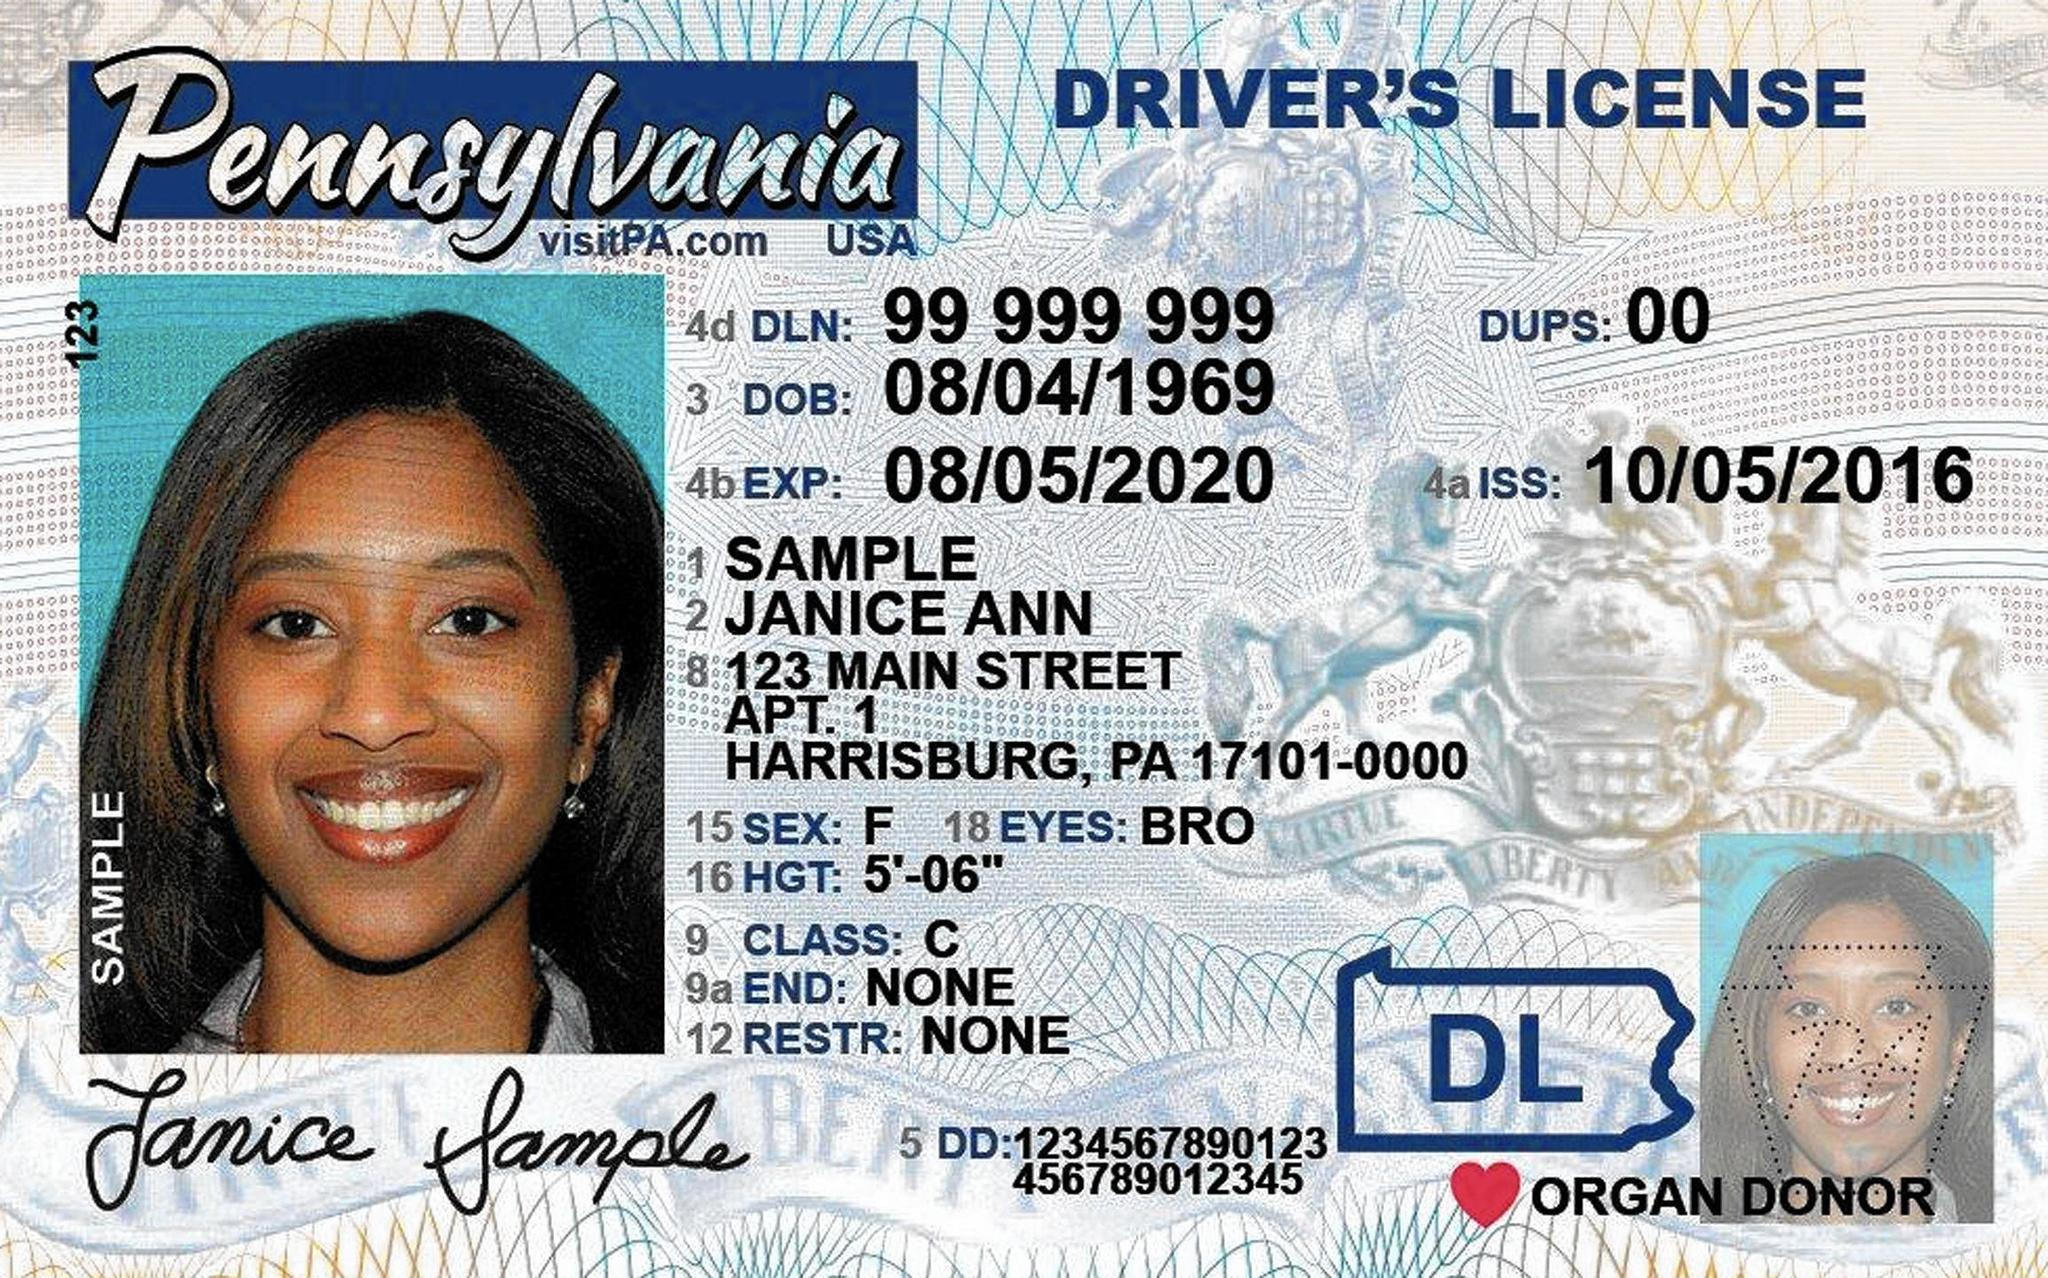 Asylum Driver Pending Driver License Pending License Pending